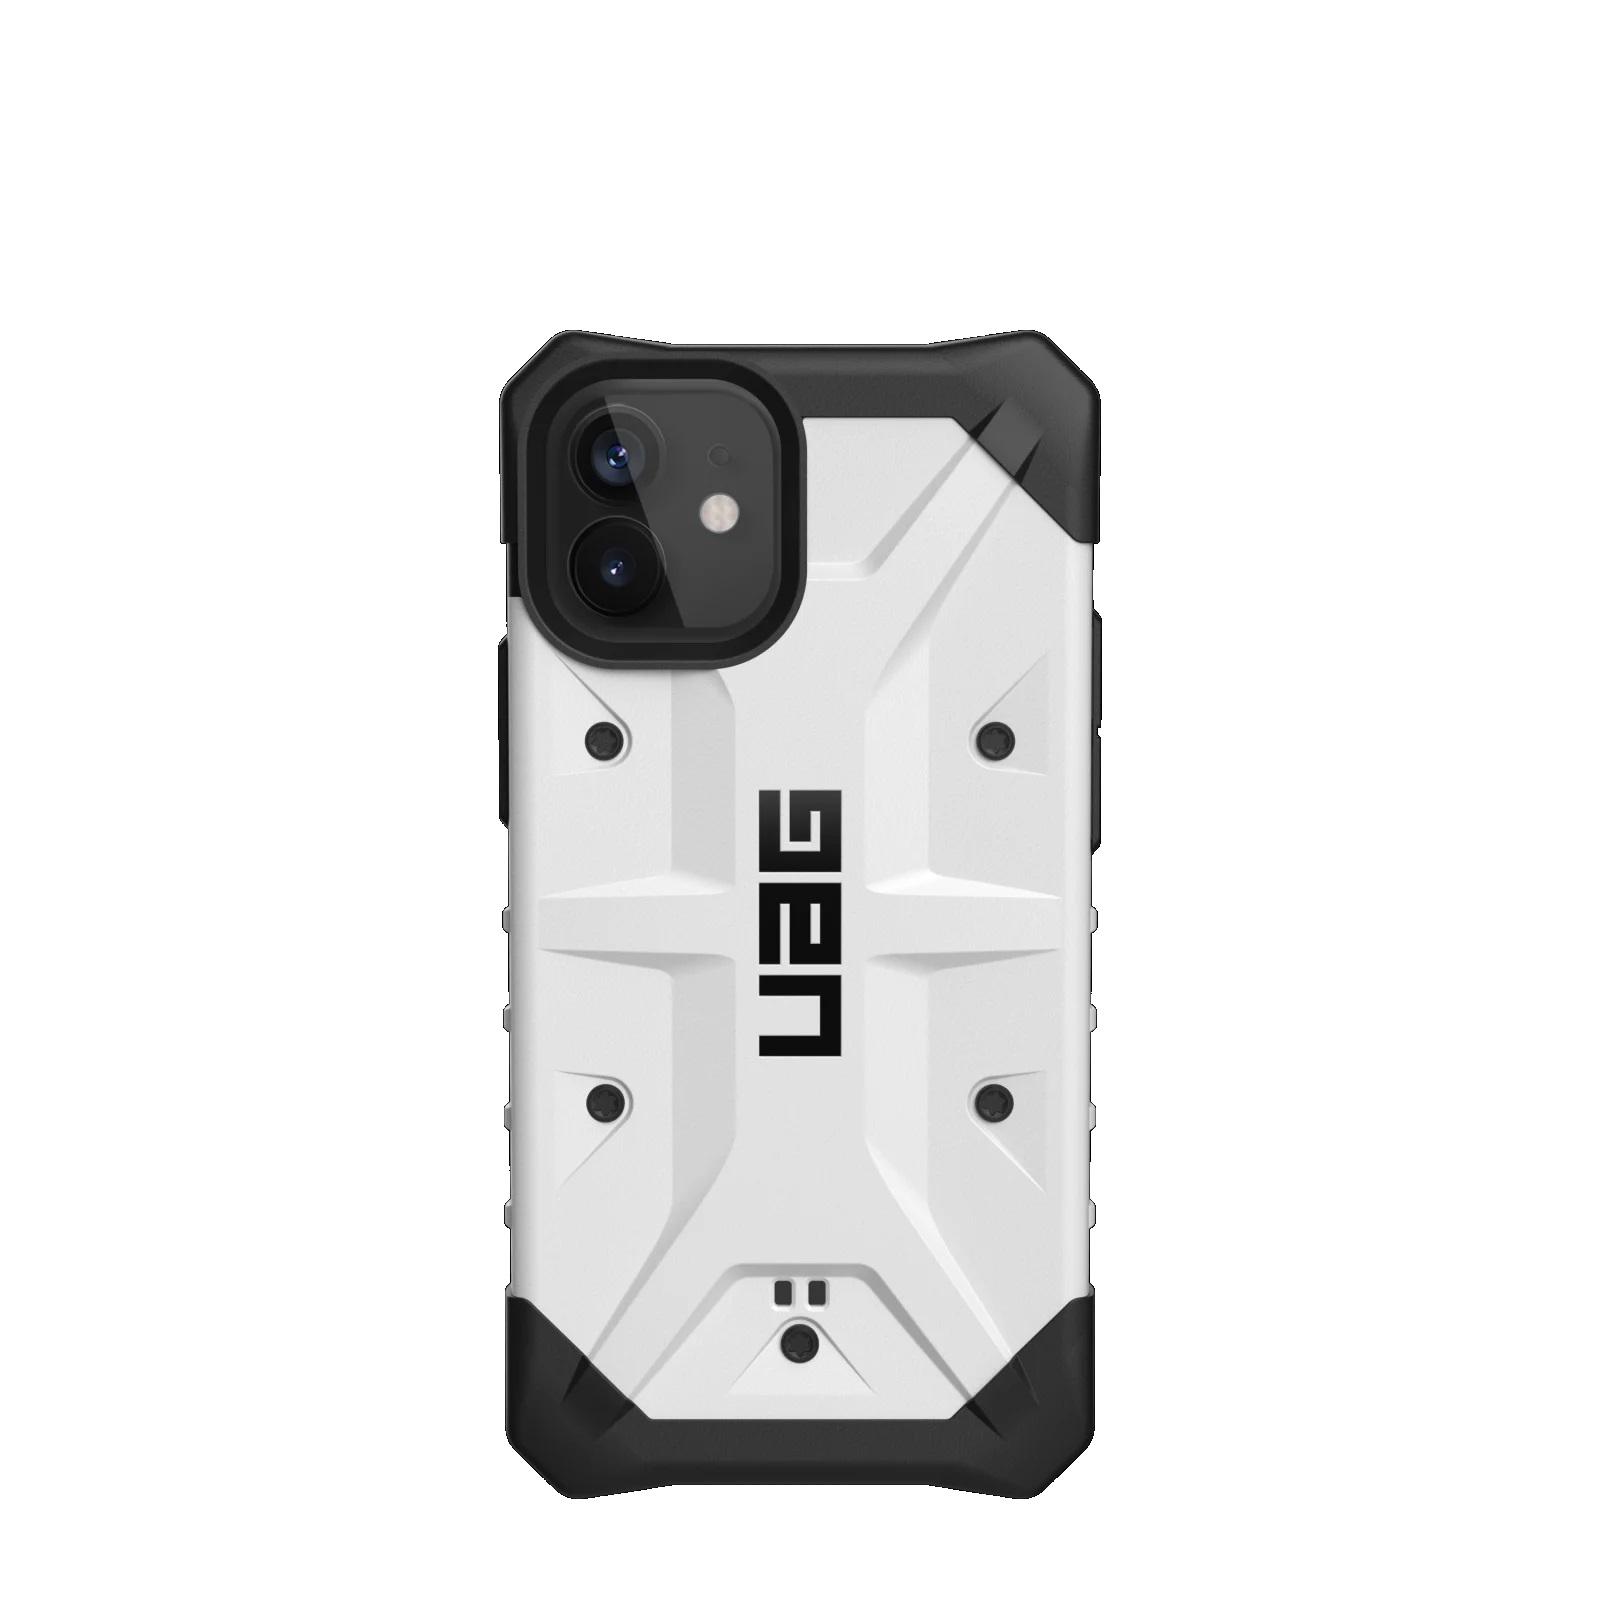 "Urban Armor Gear APPLE MILLENIUM 1 PATHFINDER ACCS funda para teléfono móvil 13,7 cm (5.4"") Negro, Blanco"